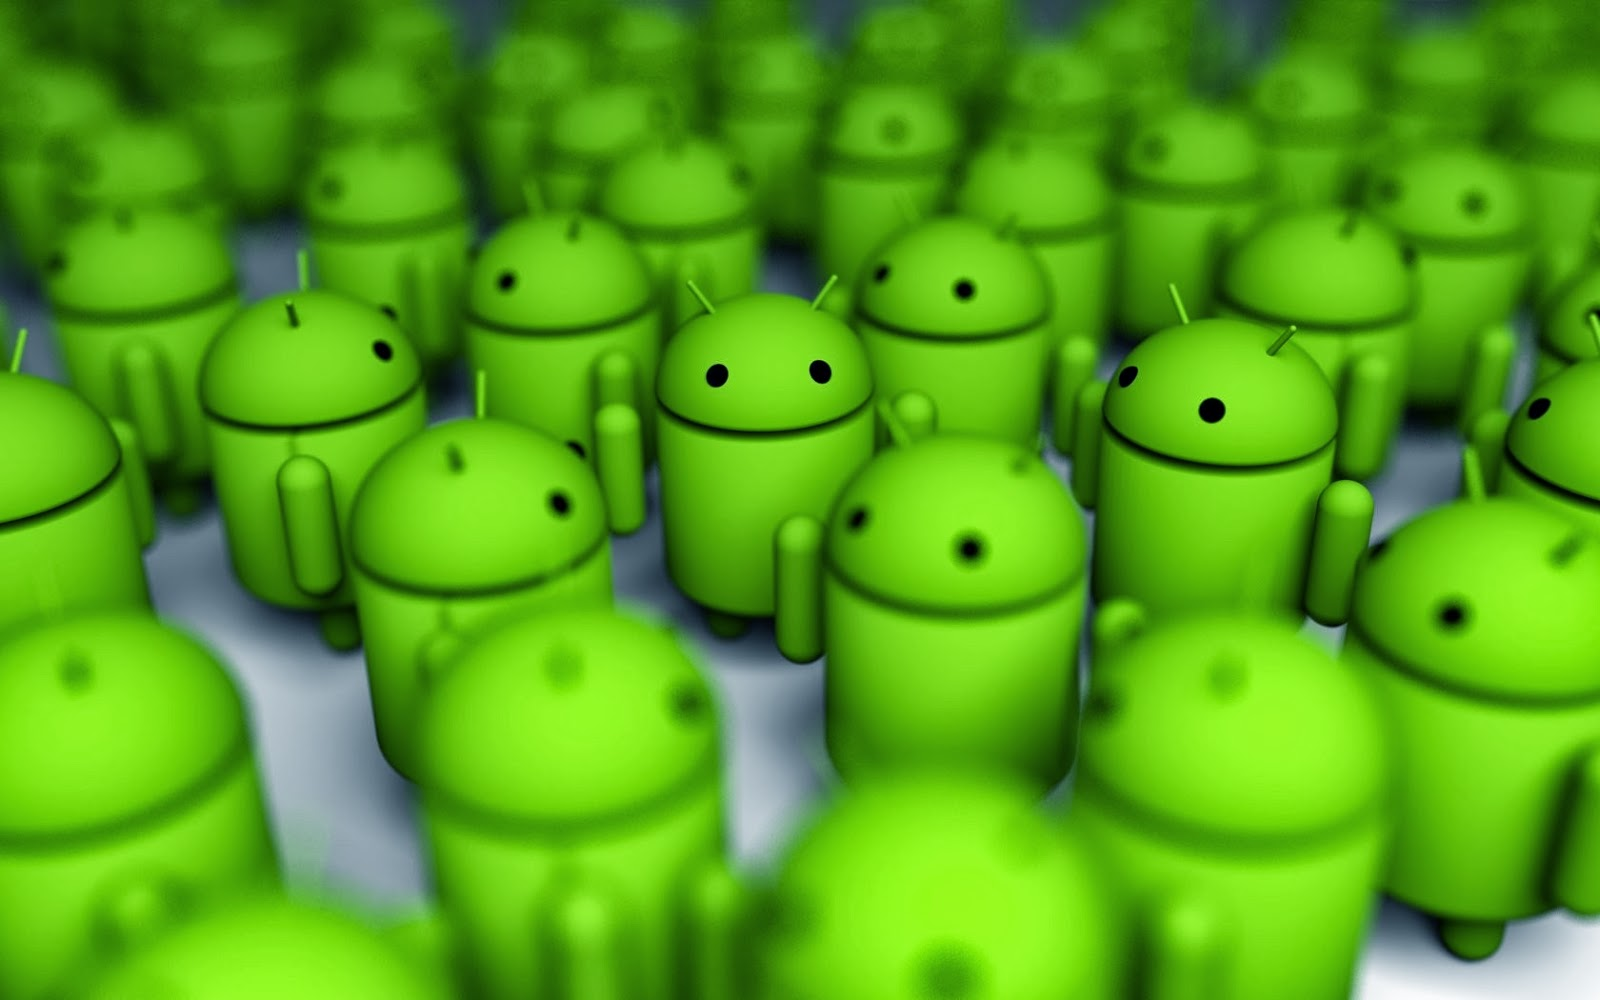 Android 3d fondo 3d de androides fondos de pantalla hd for Fondos de pantalla para android